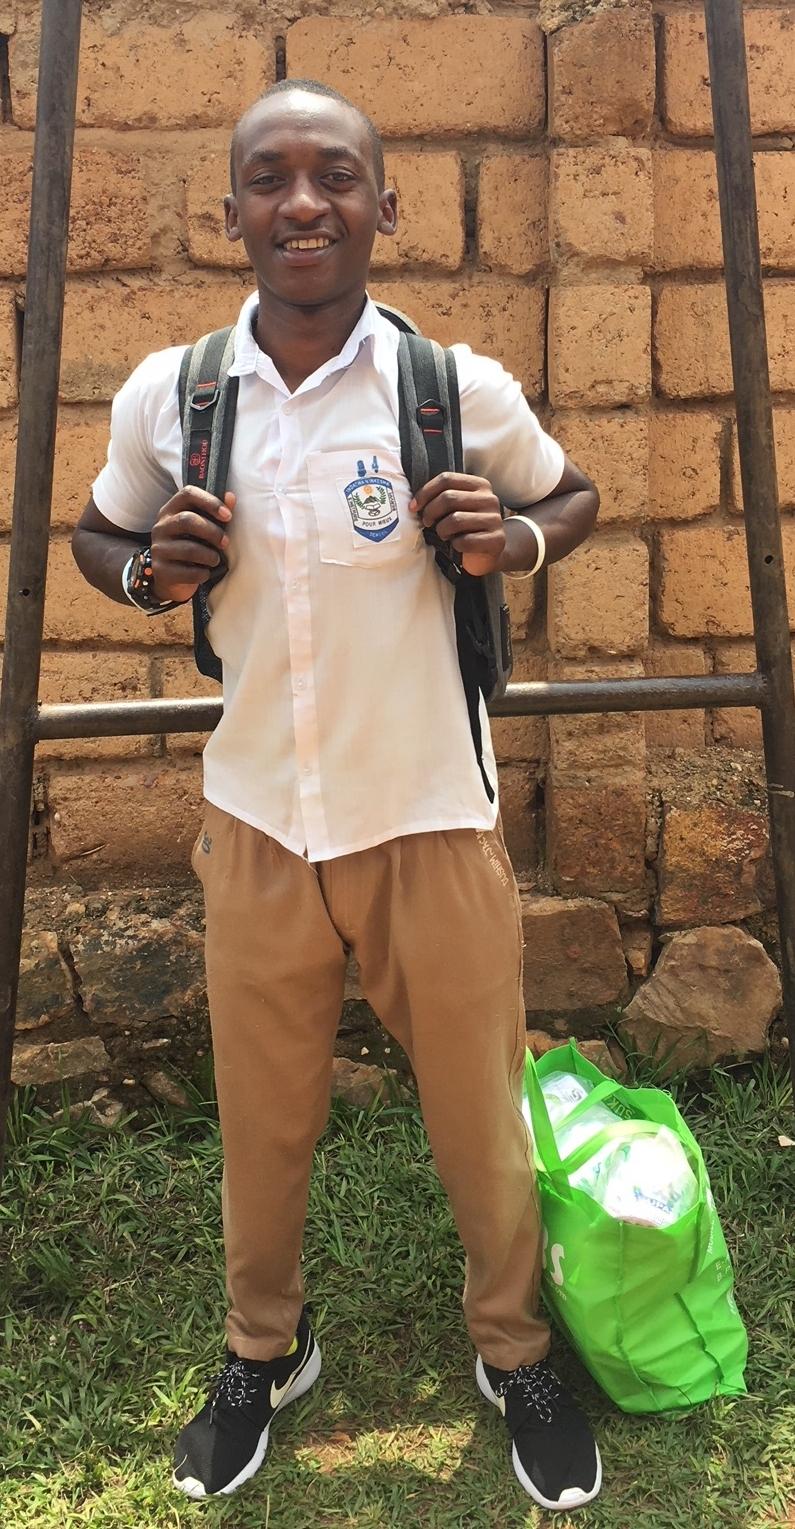 Jack before he left for school